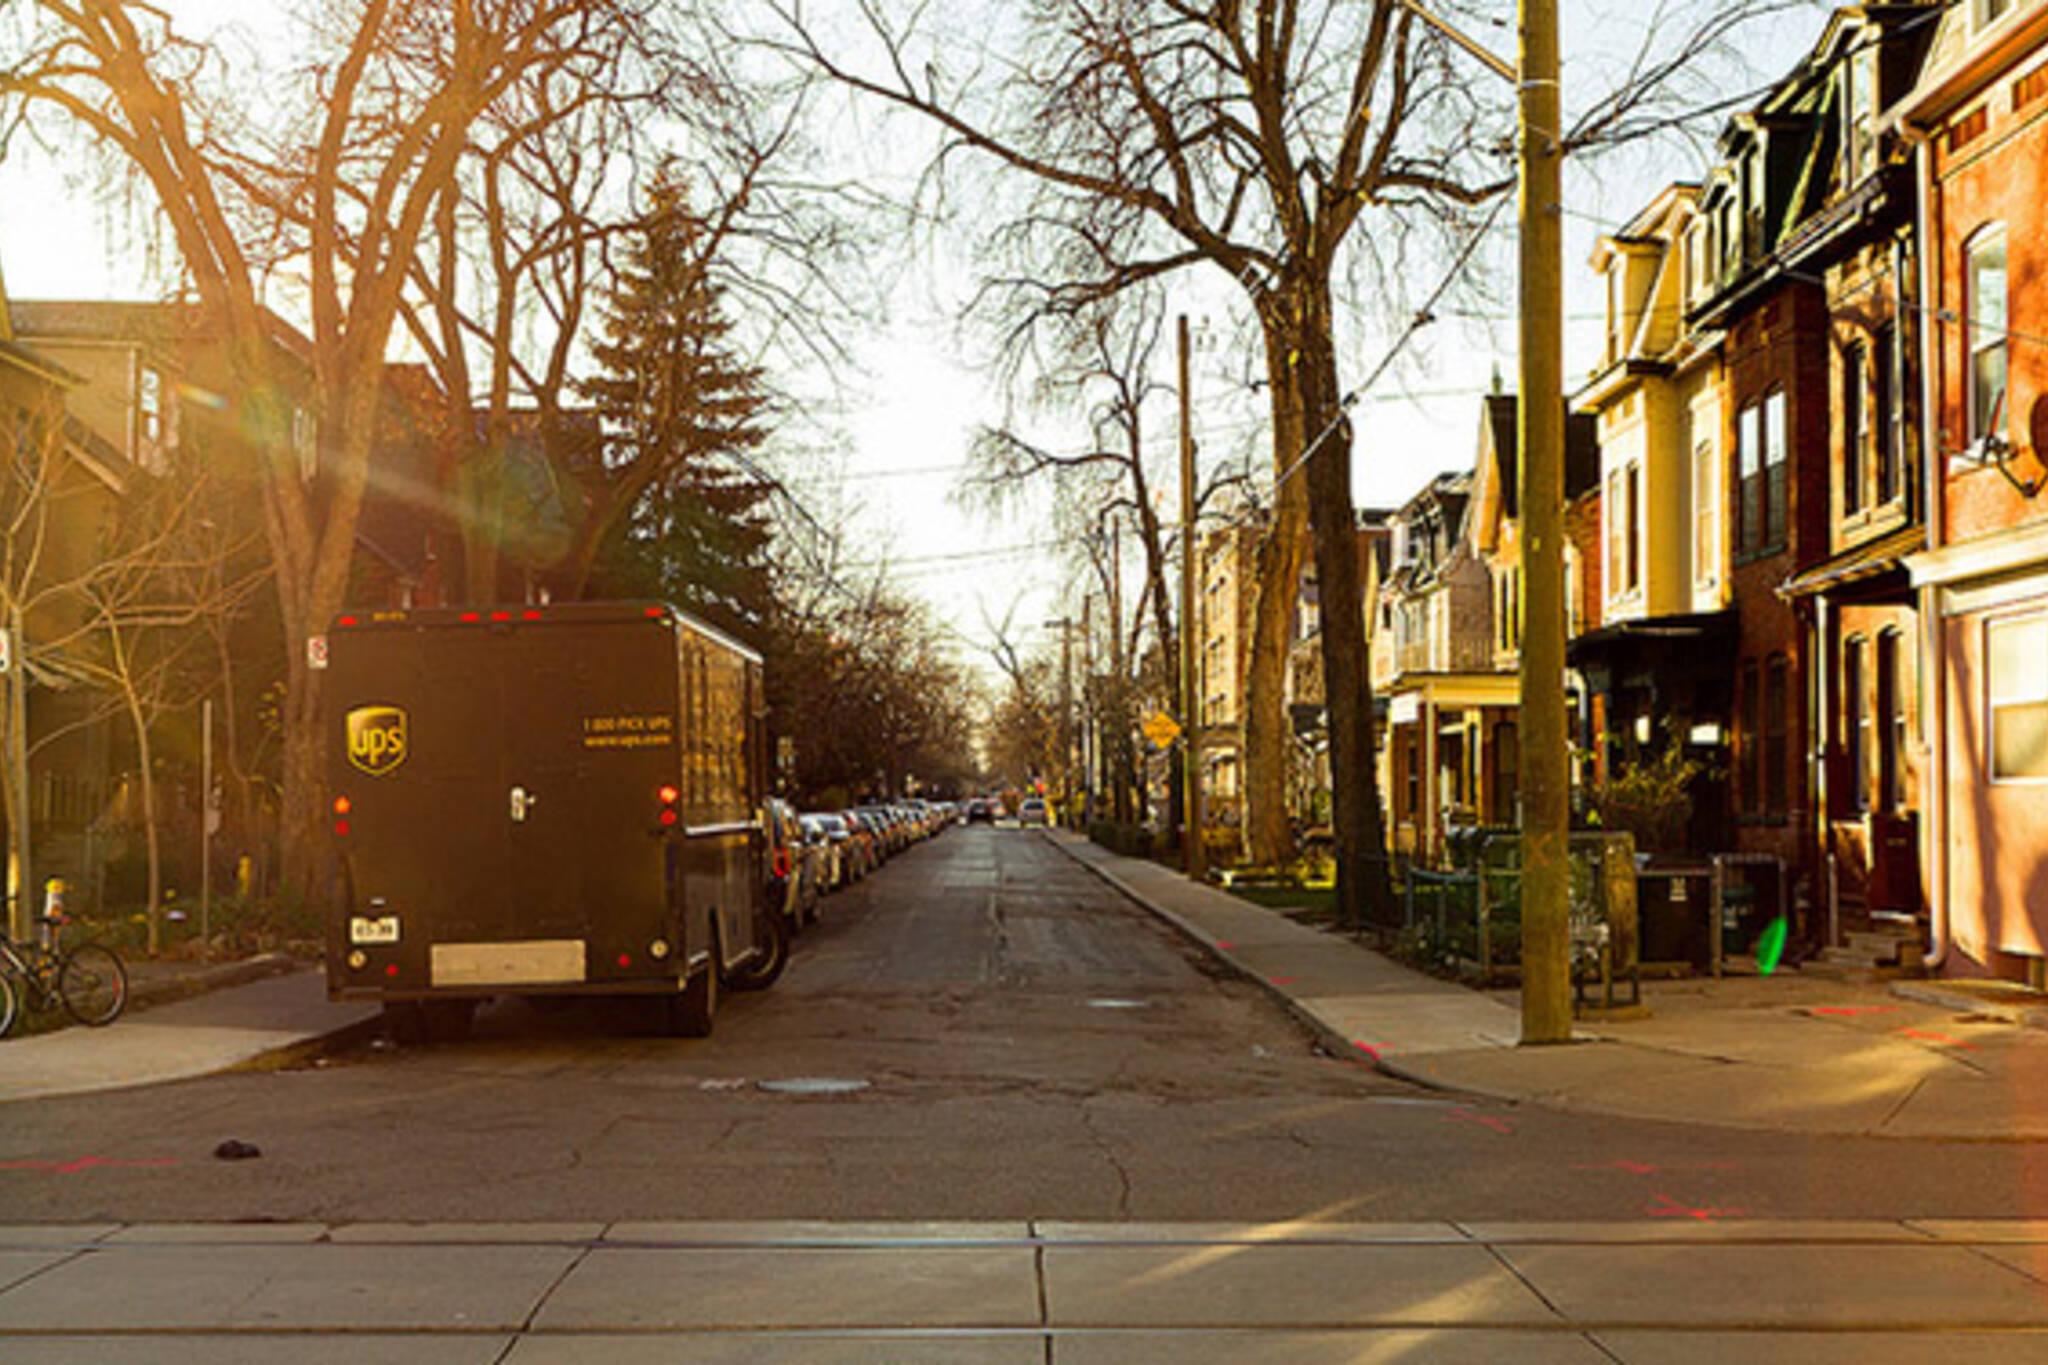 sun, street, road